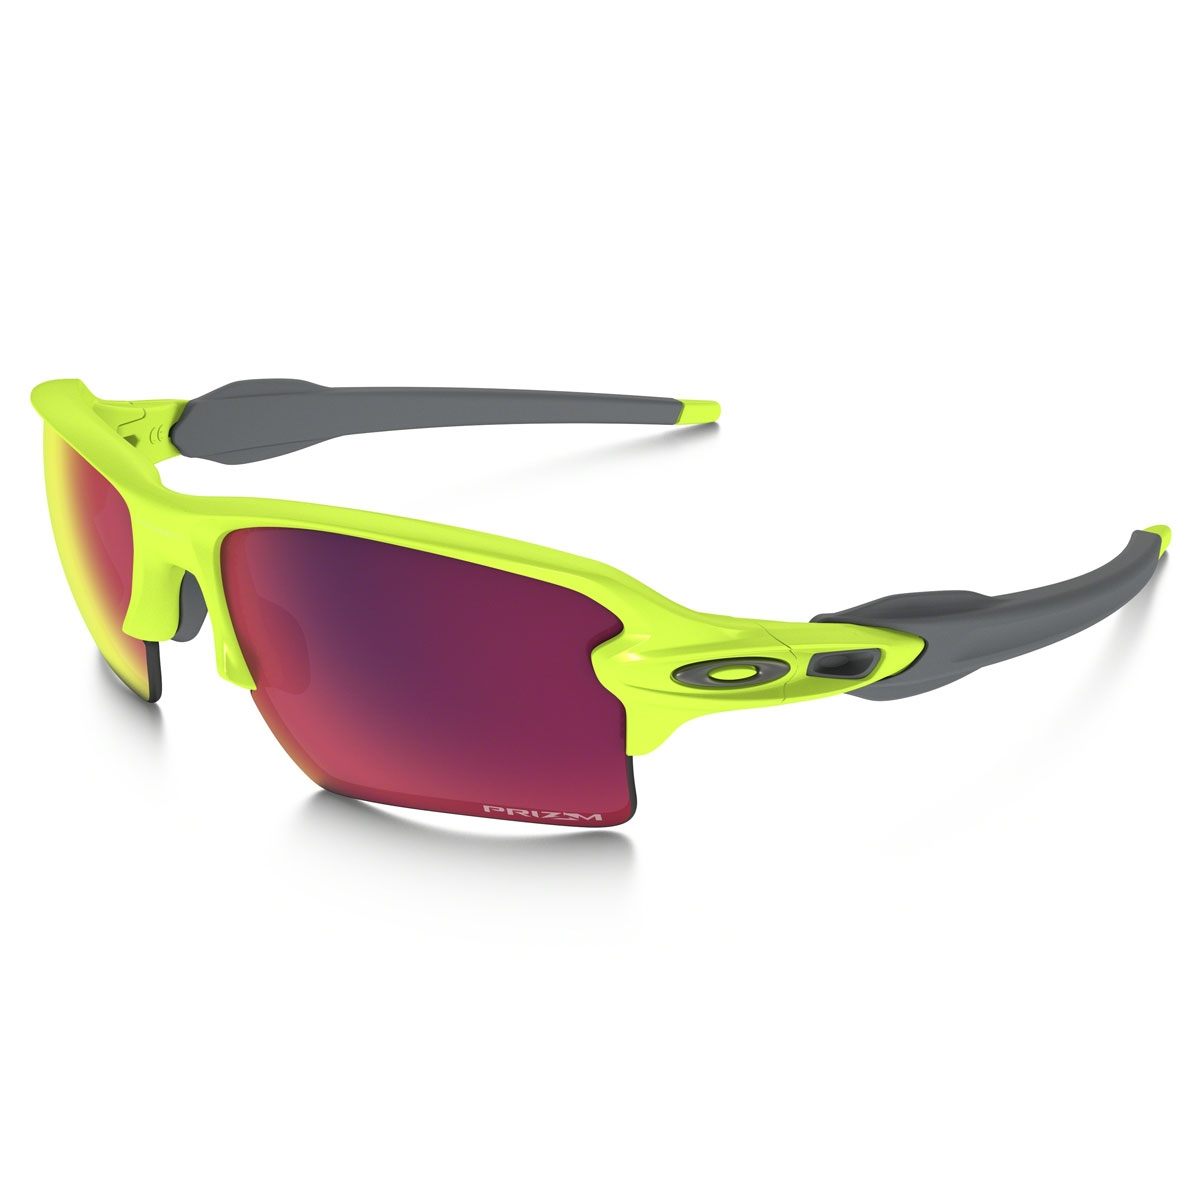 dd370e4644 Image of Oakley Flak 2.0 XL Retina Burn Prizm Road Sunglasses - Retina  Burn Prizm